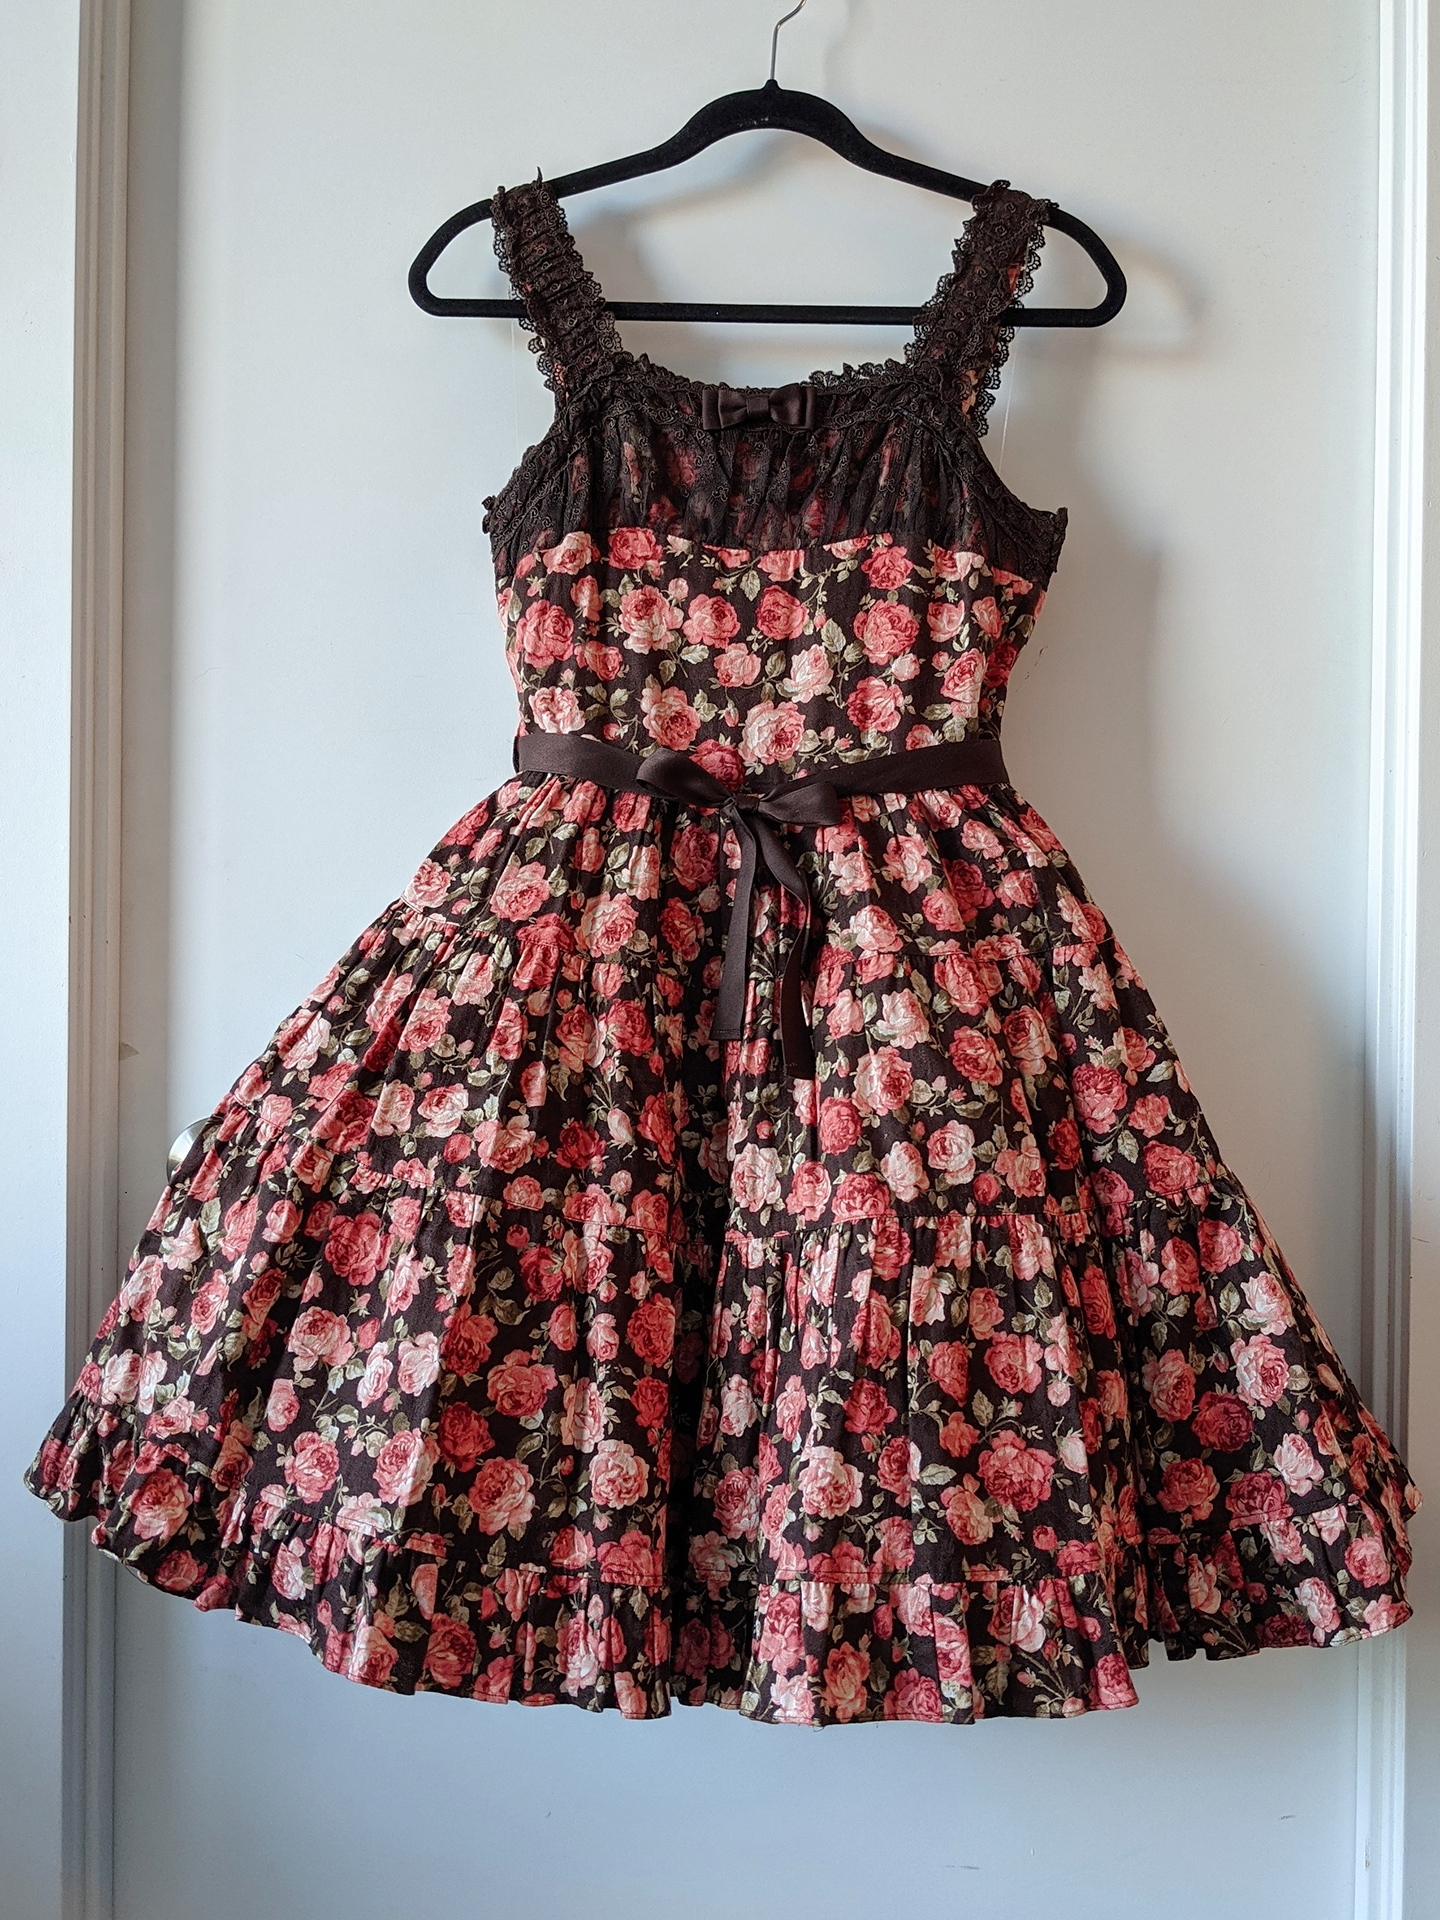 Lucky pack dress by Innocent World